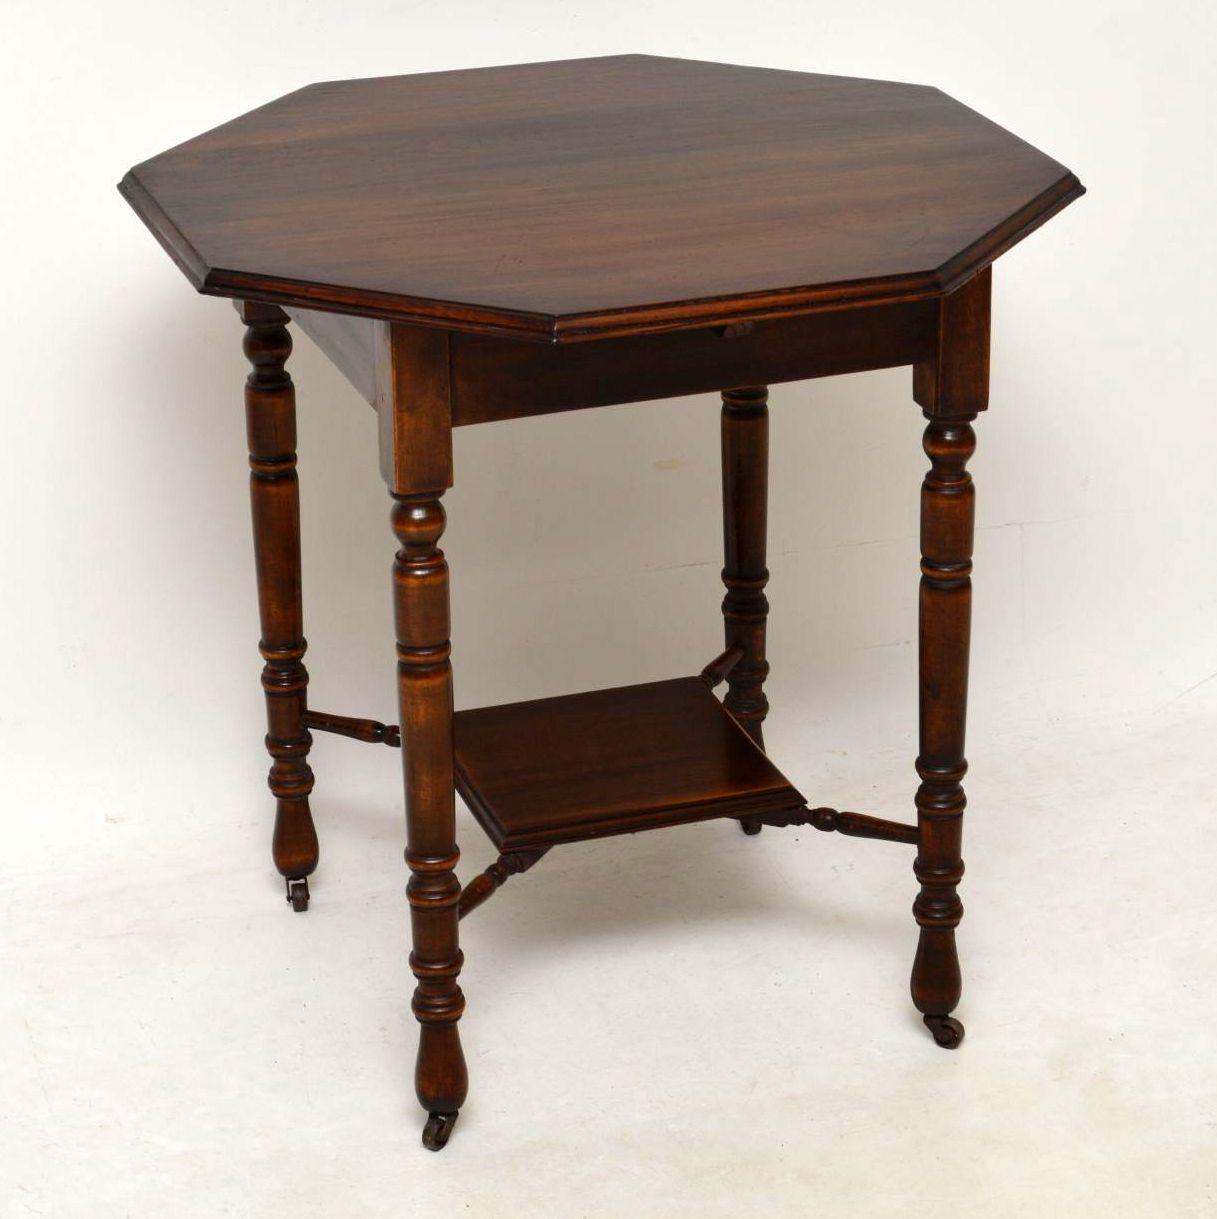 englische m bel und antiquit ten bei morris antik englische m bel blog. Black Bedroom Furniture Sets. Home Design Ideas